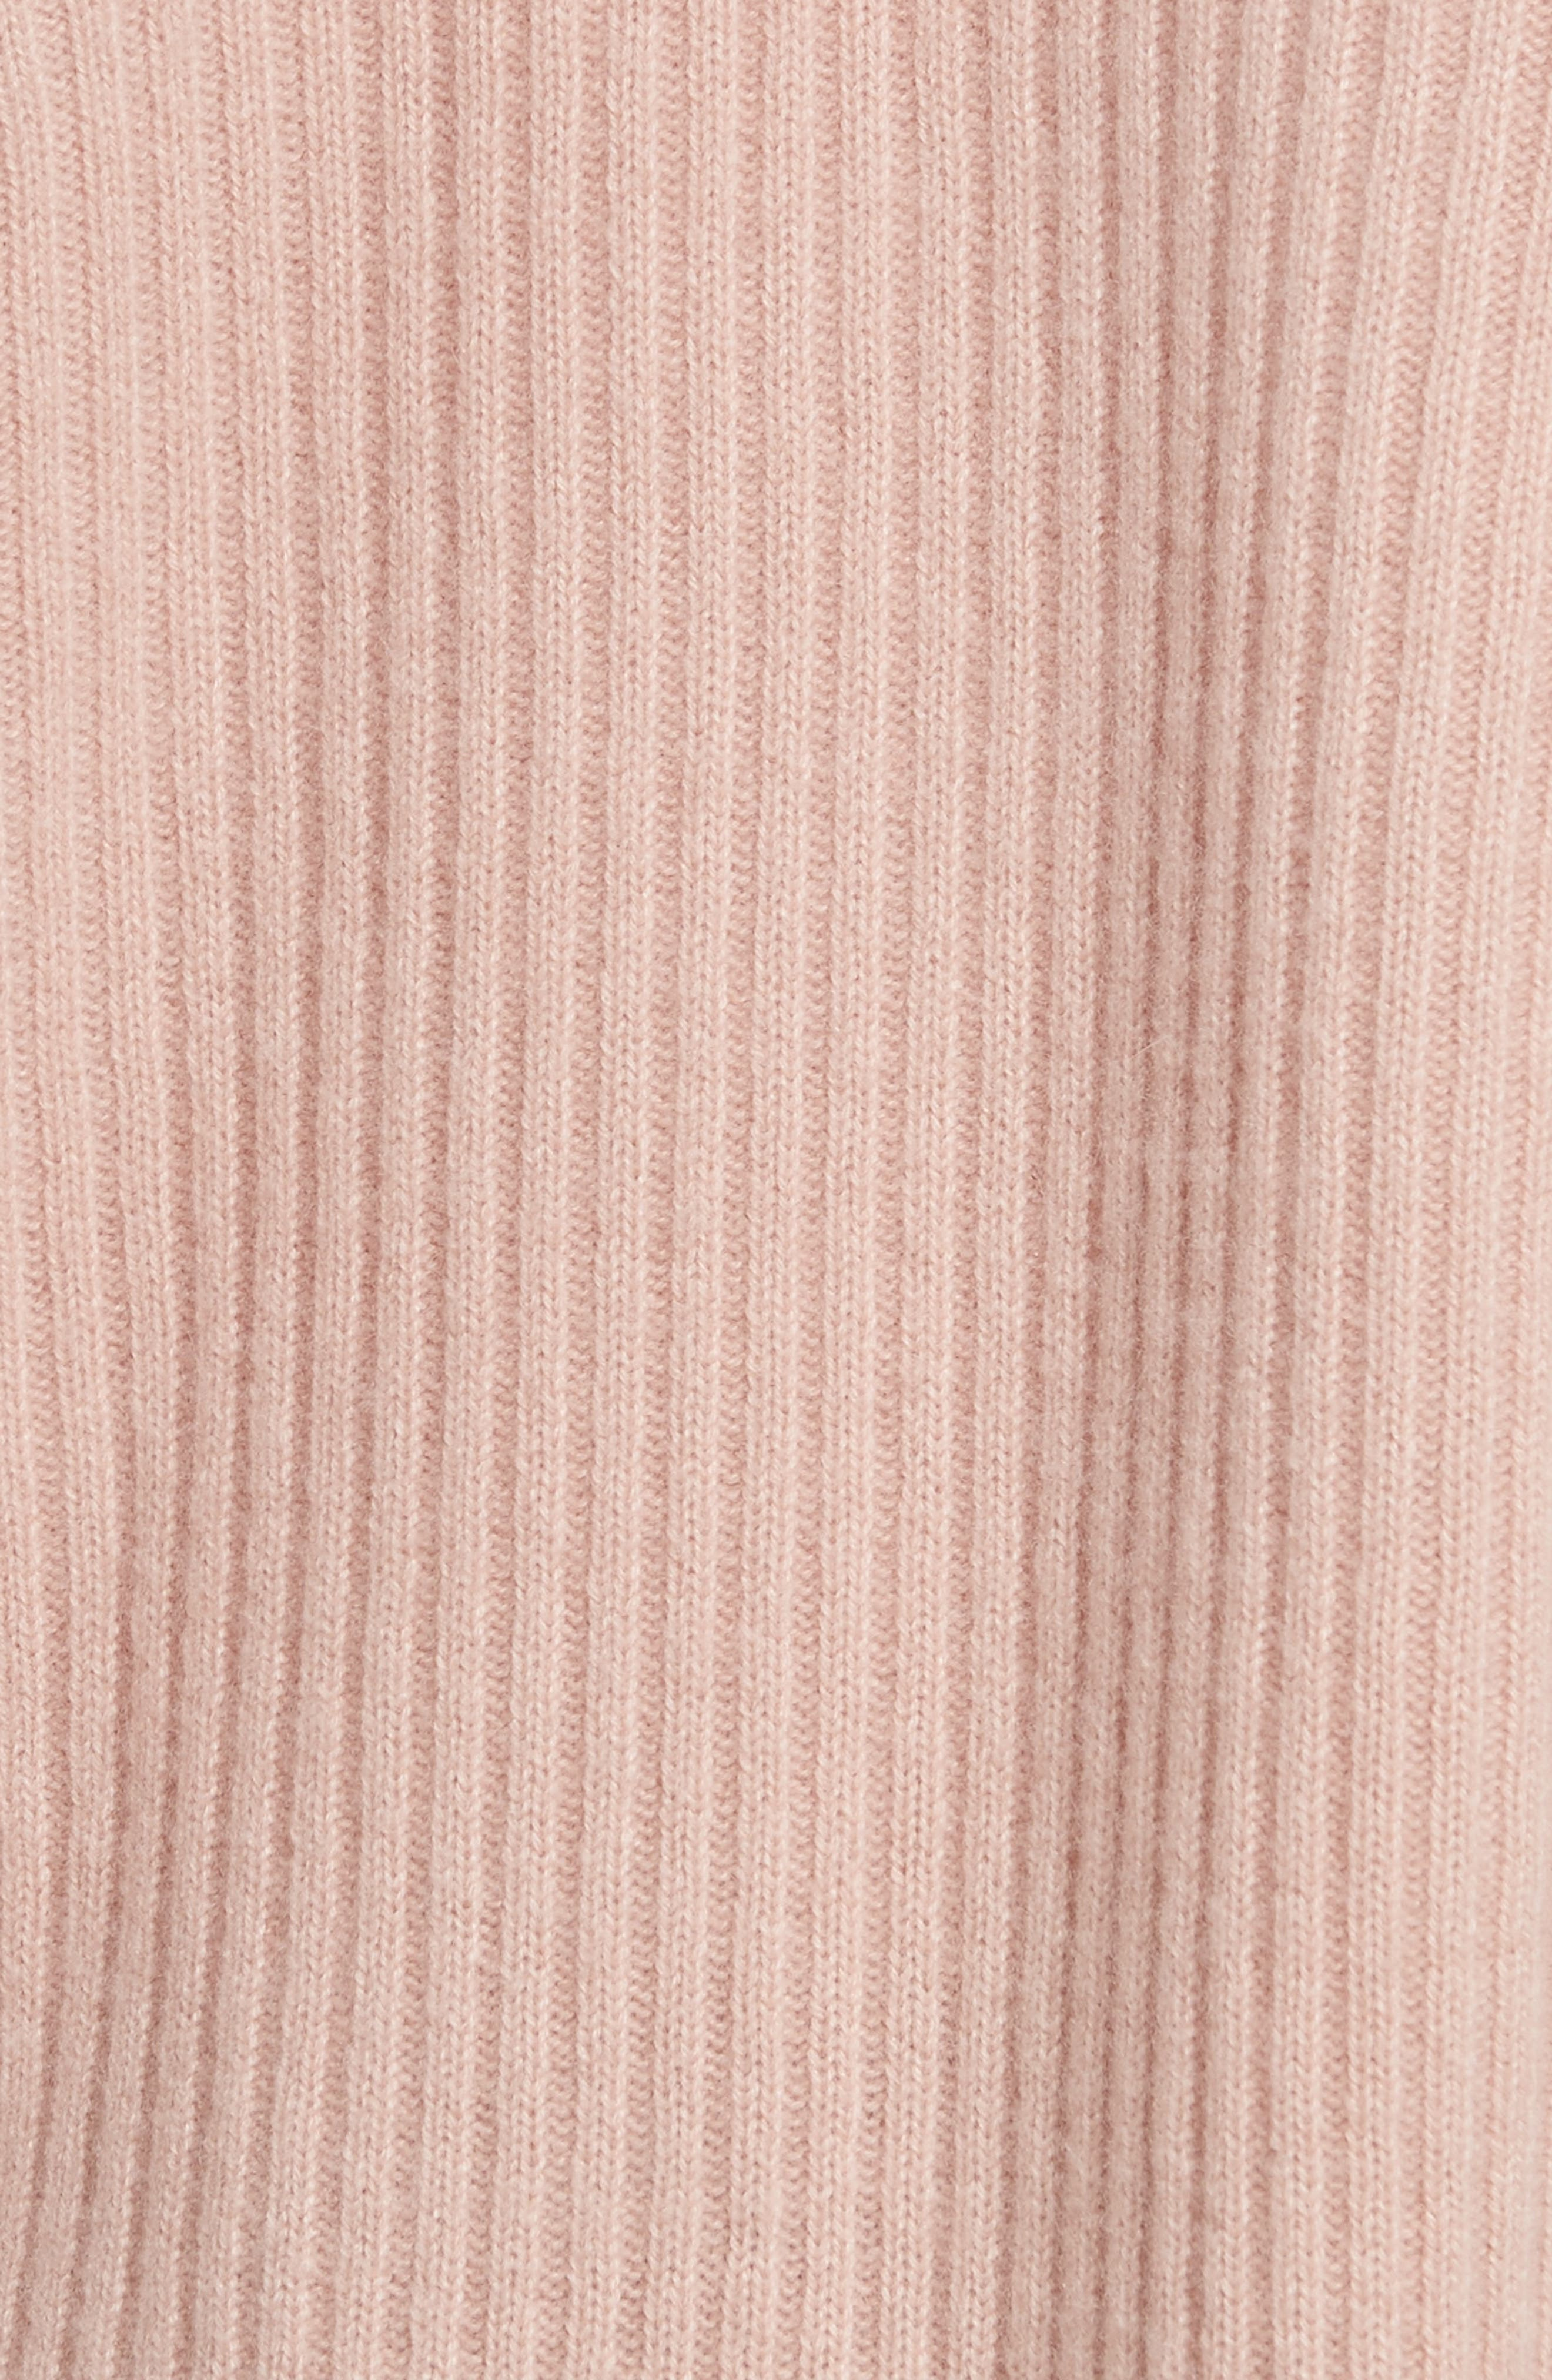 Wool Blend Raglan V-Neck Sweater,                             Alternate thumbnail 5, color,                             Quartz